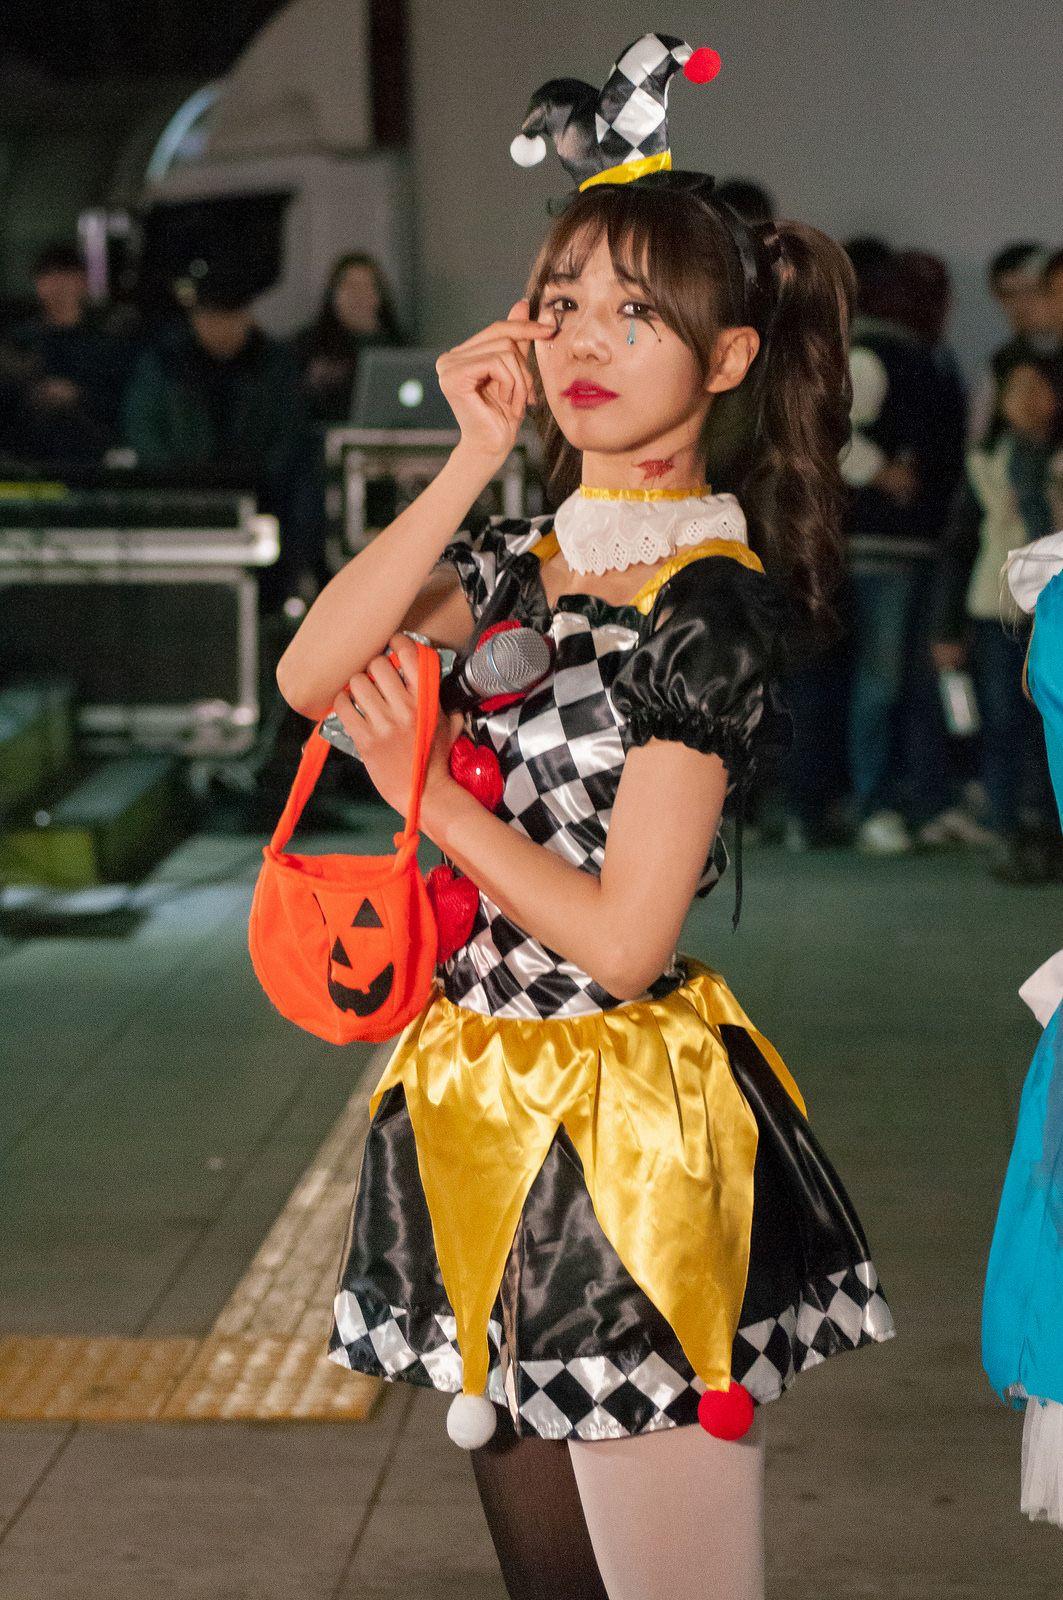 Yoohyeon In Halloween Costume Oc Kpop Halloween Costume Halloween Costumes For Girls Halloween Girl